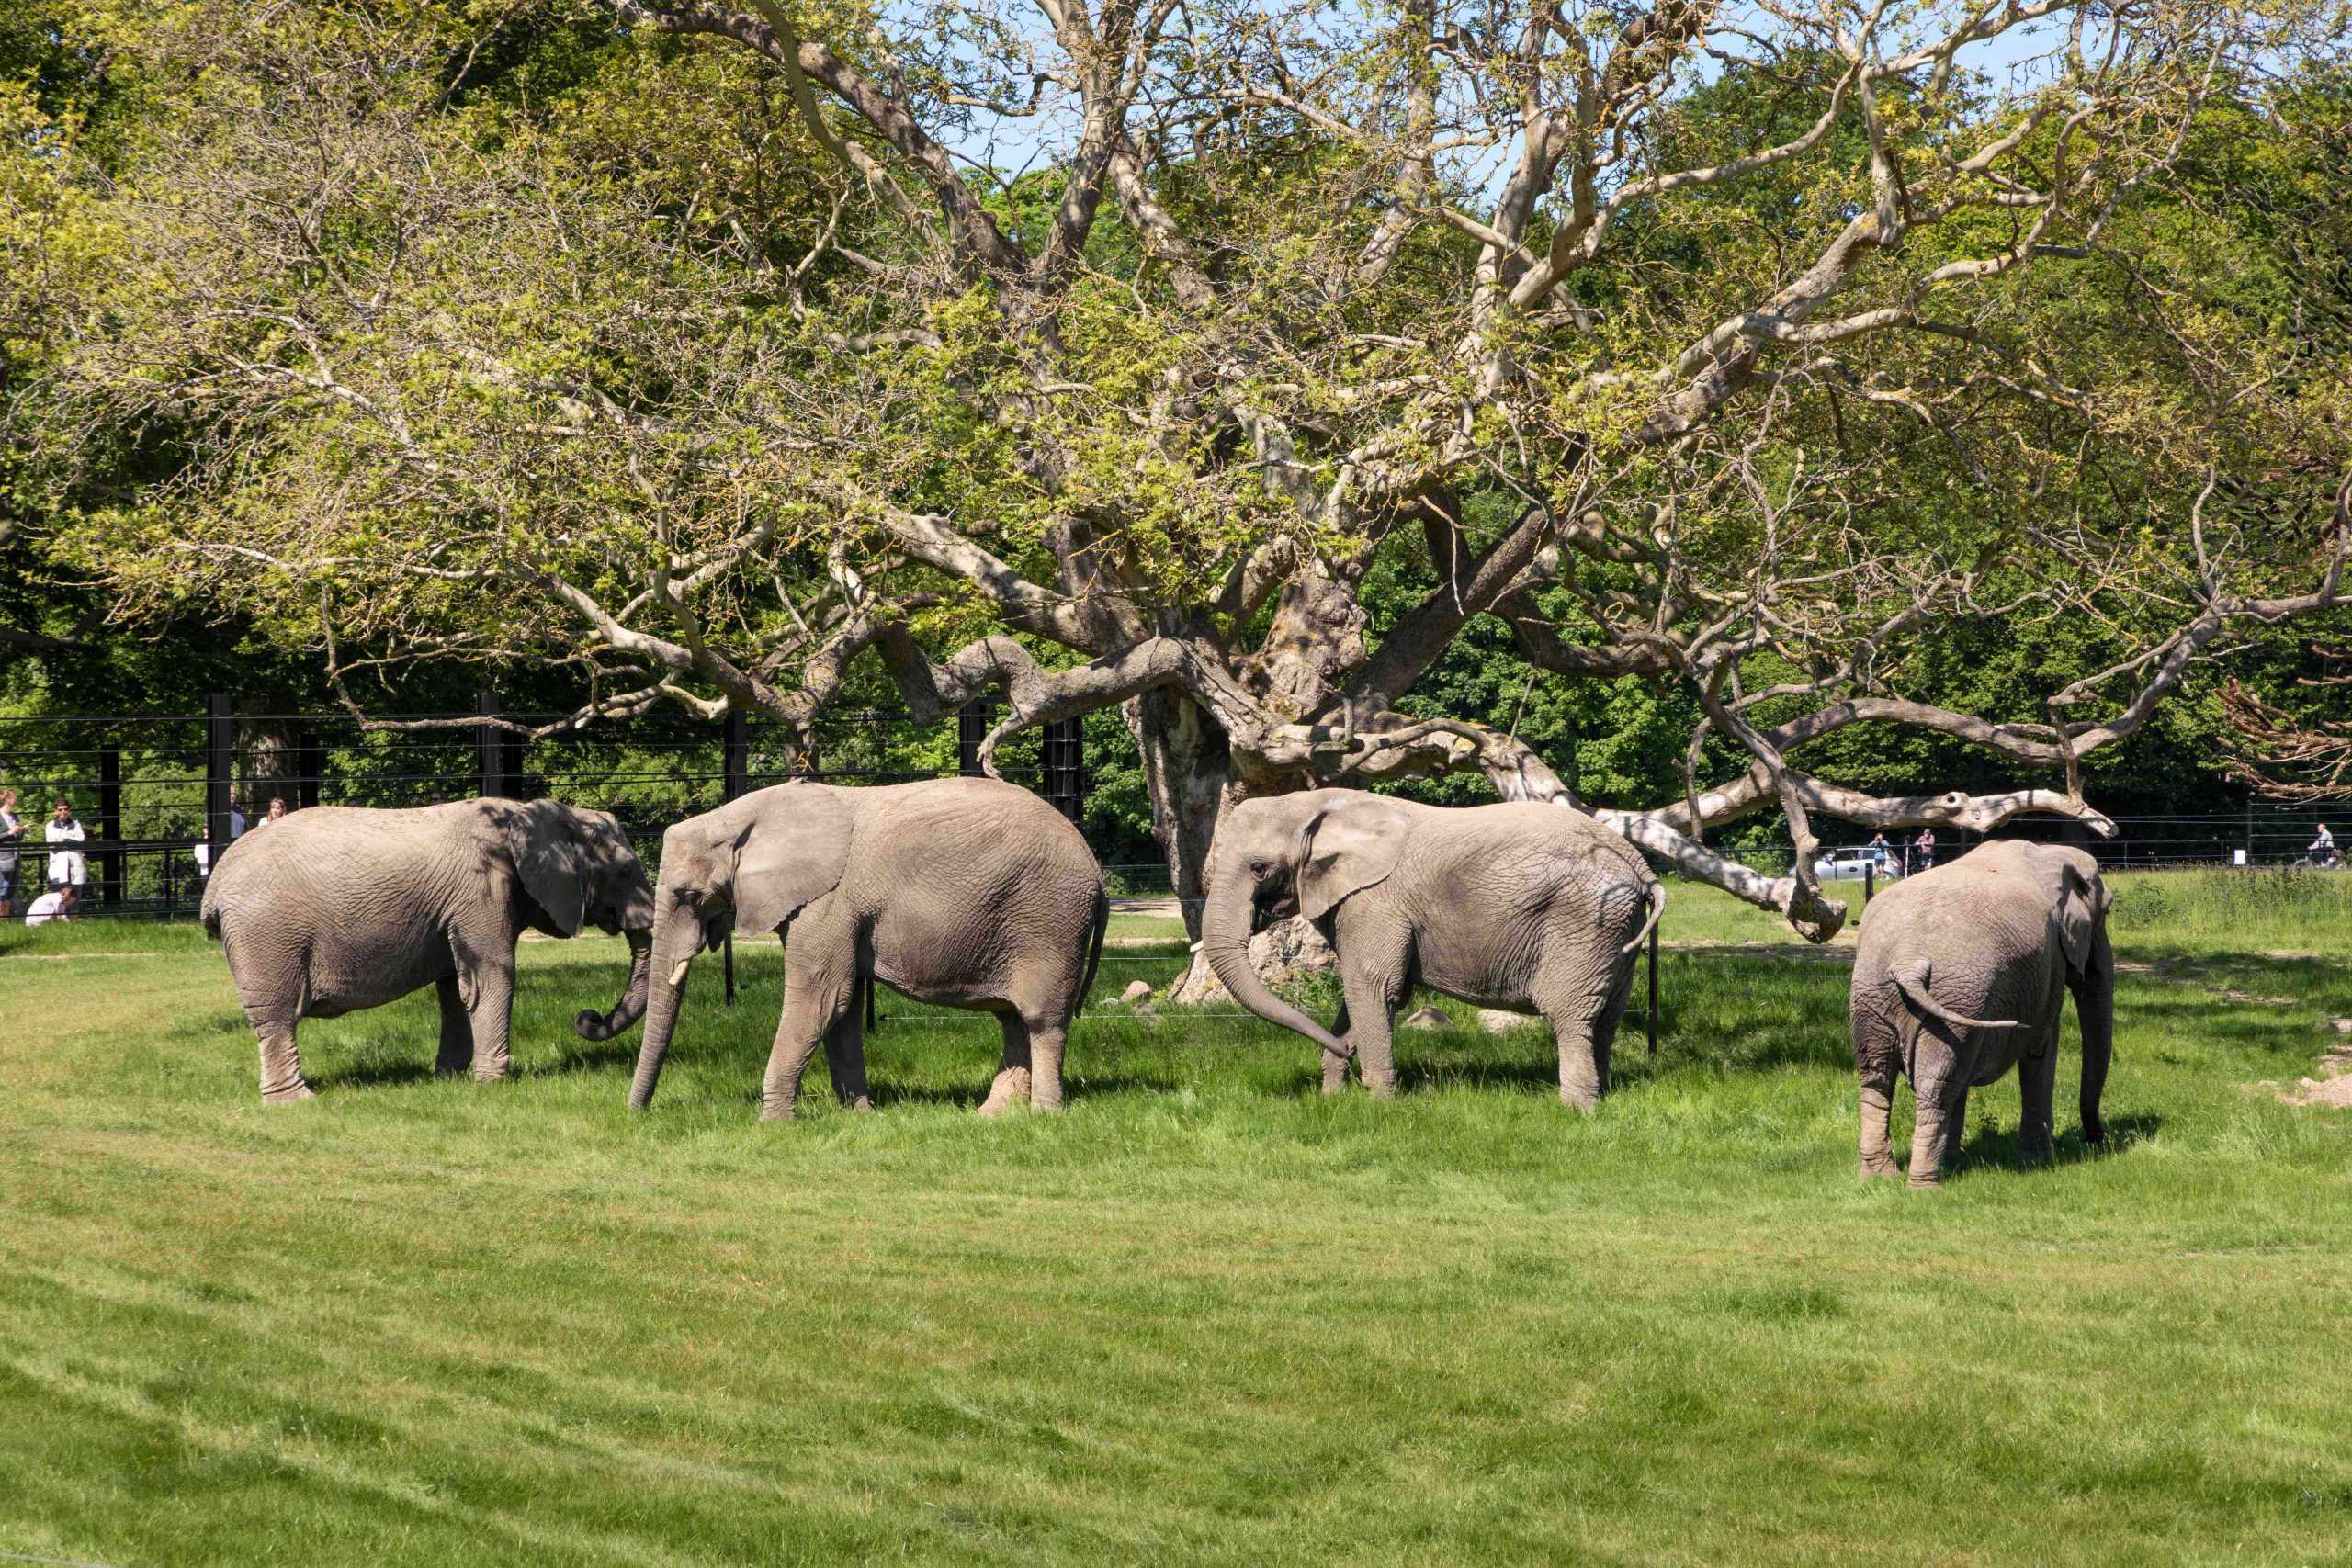 cirkuselefanter, elefanter, safari, park, knuthenborg